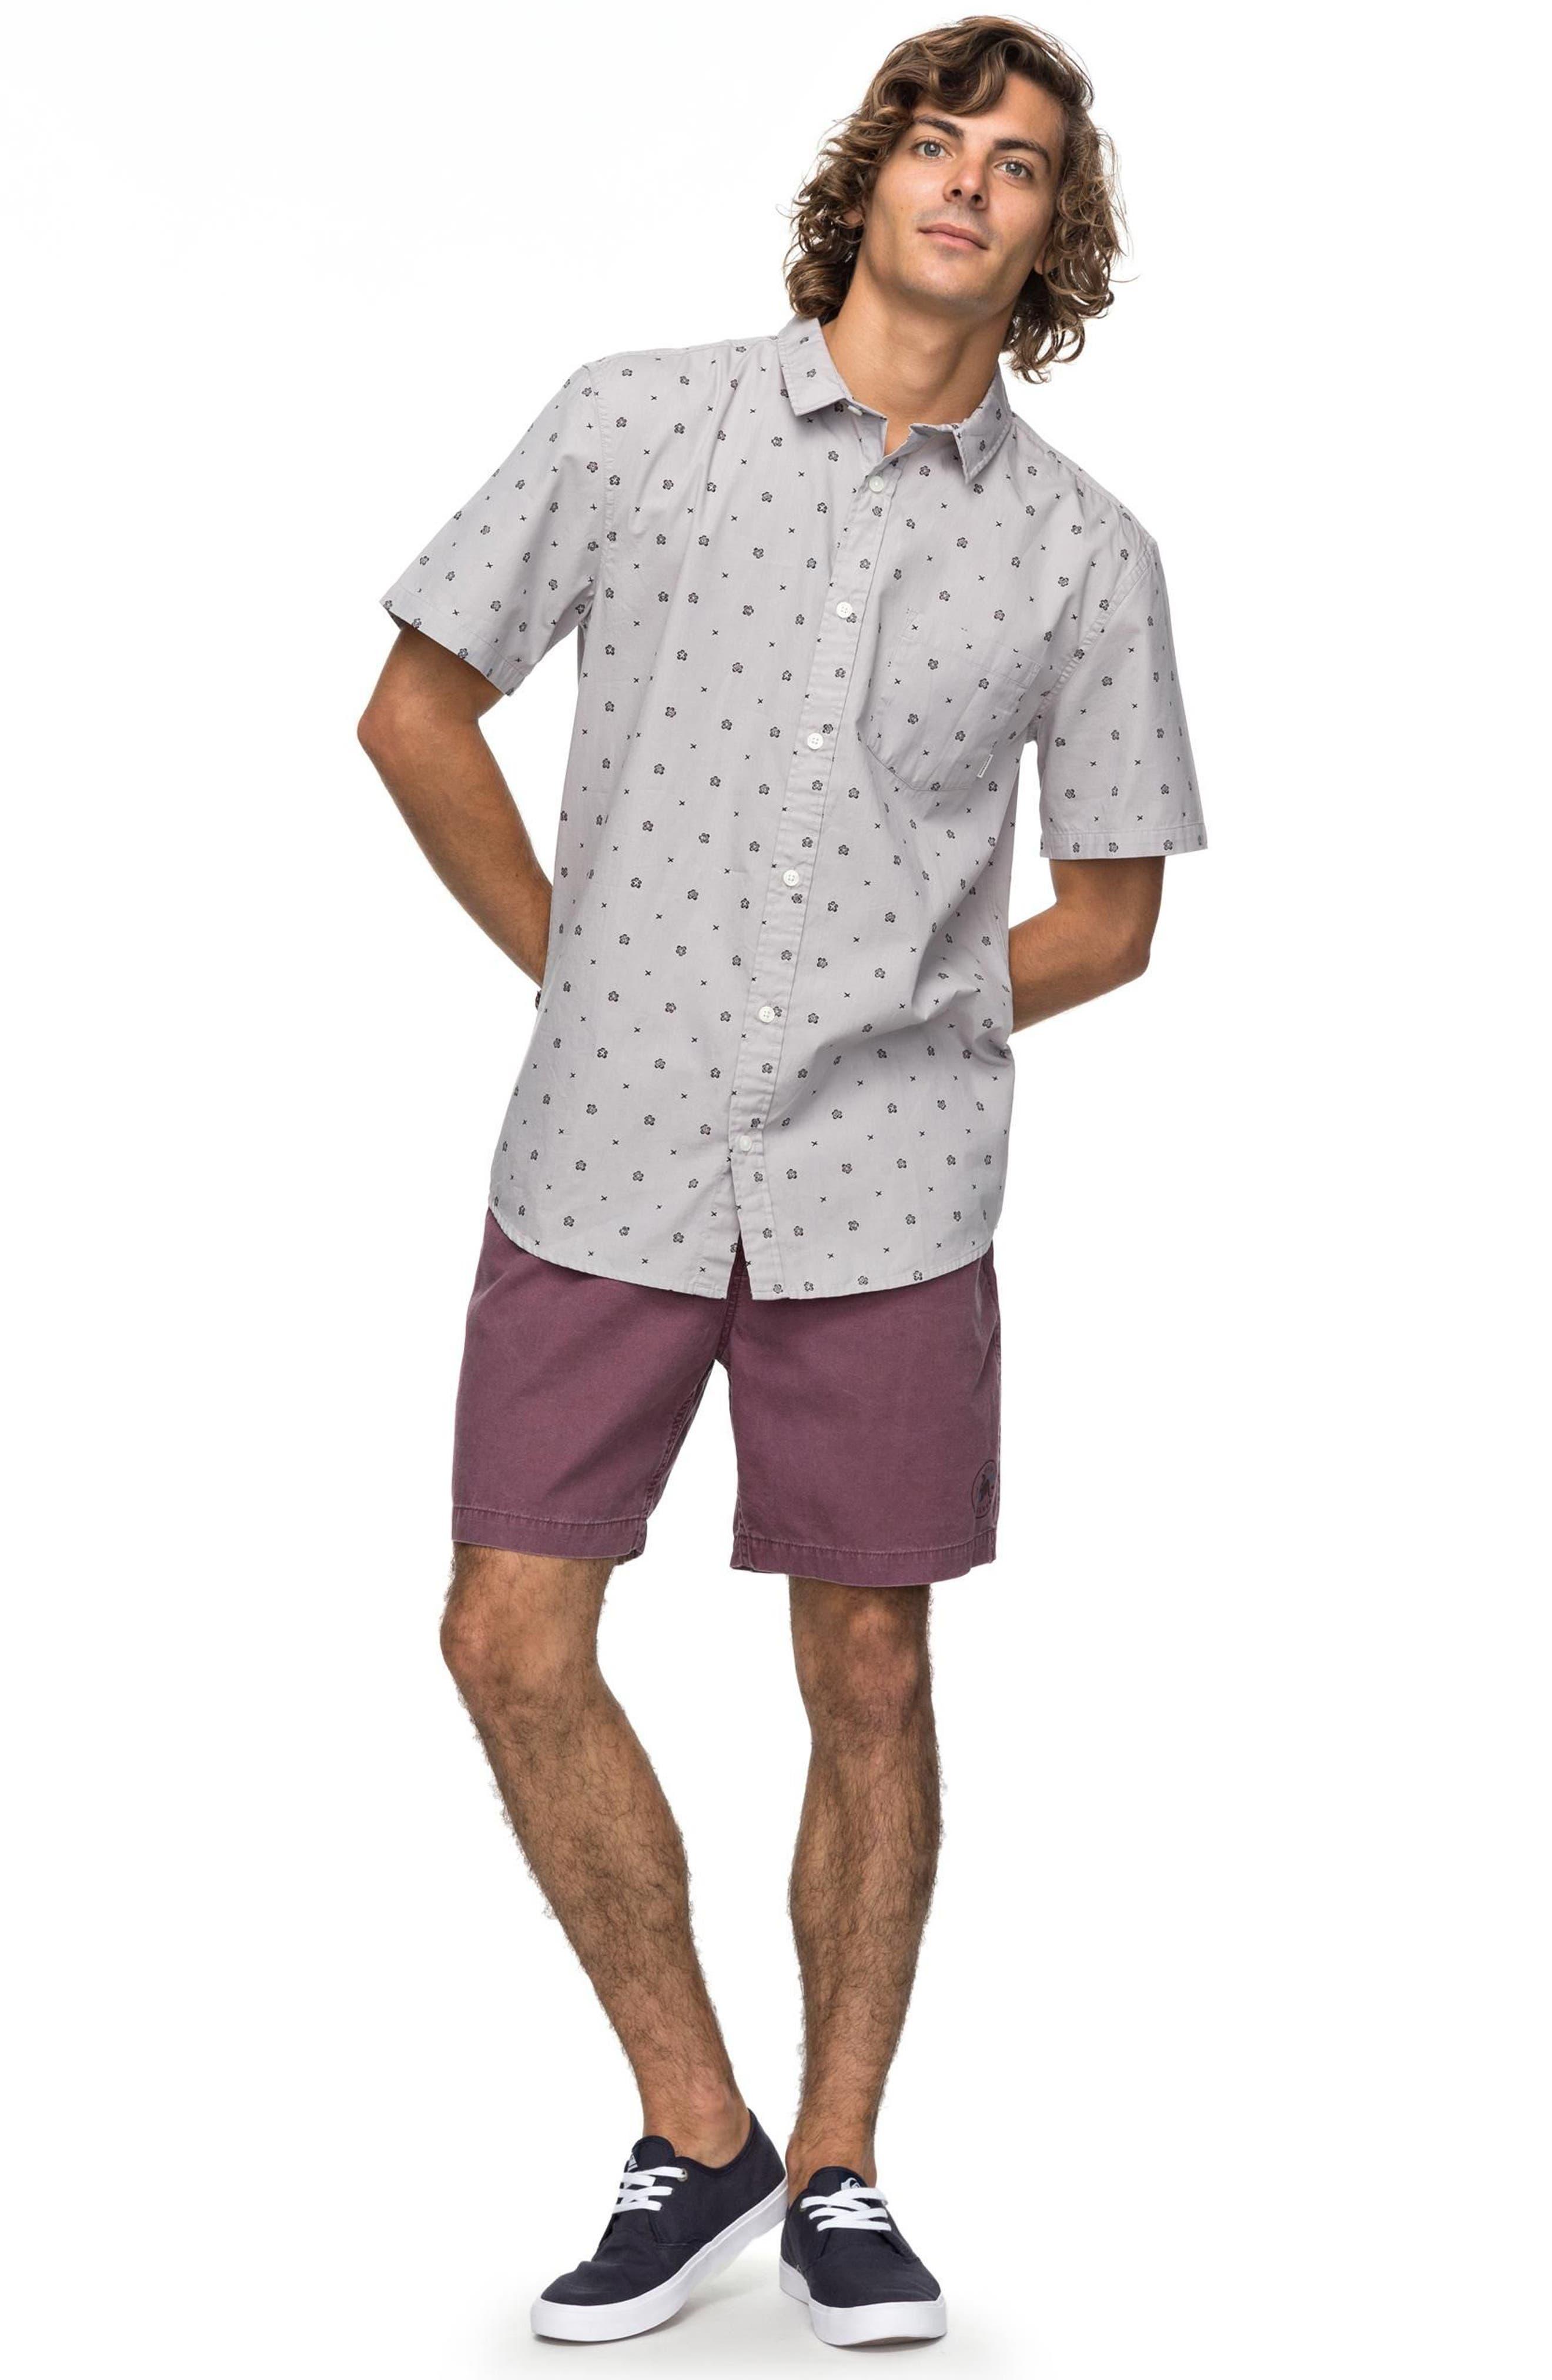 Kamanoa Short Sleeve Shirt,                             Alternate thumbnail 3, color,                             Silver Sconce